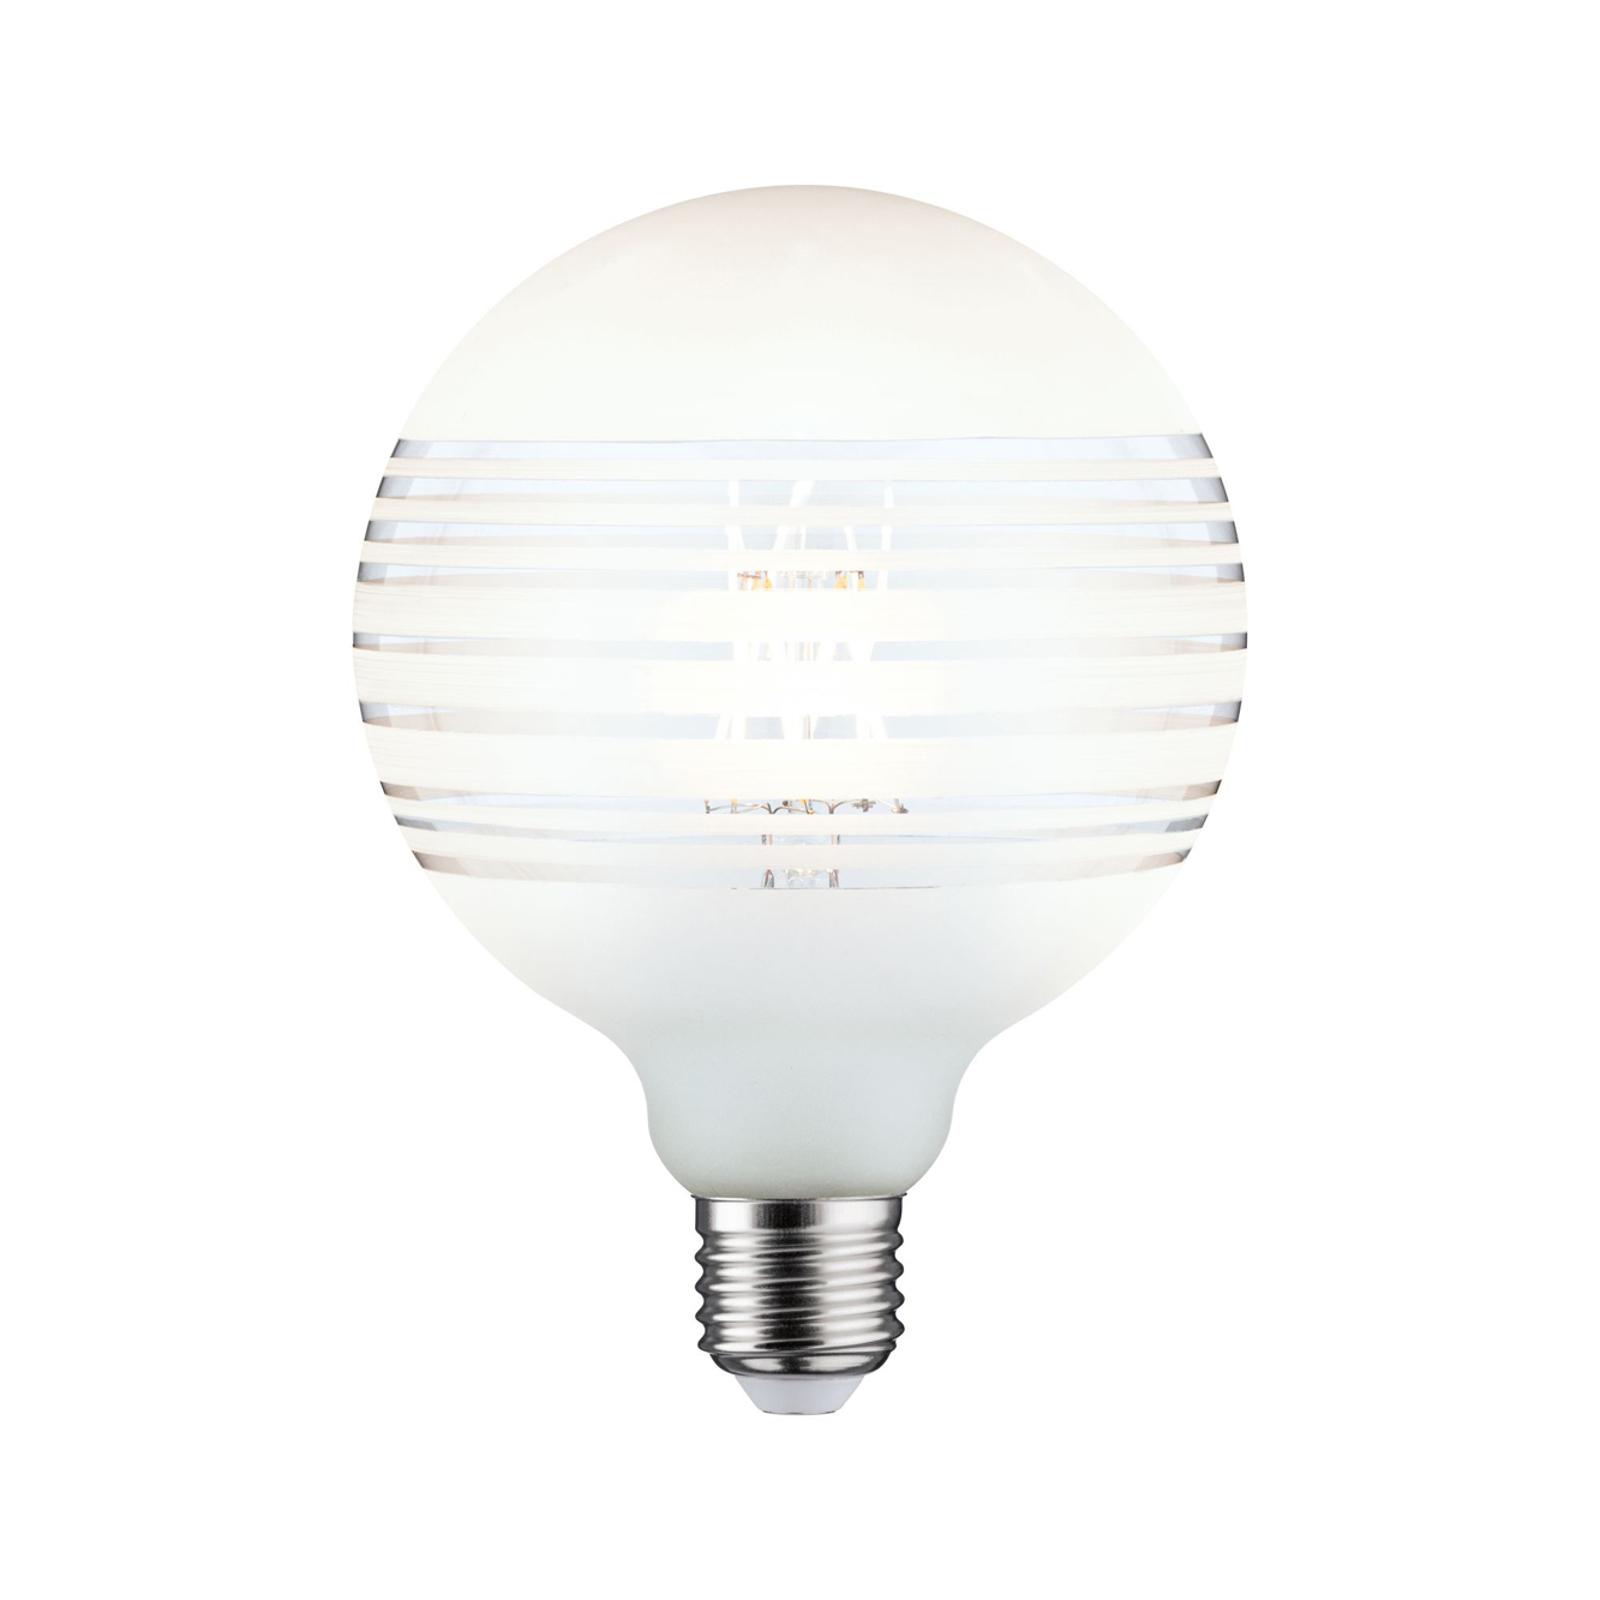 Paulmann E27 LED-Globe 4,5W Ringspiegel liniert kaufen